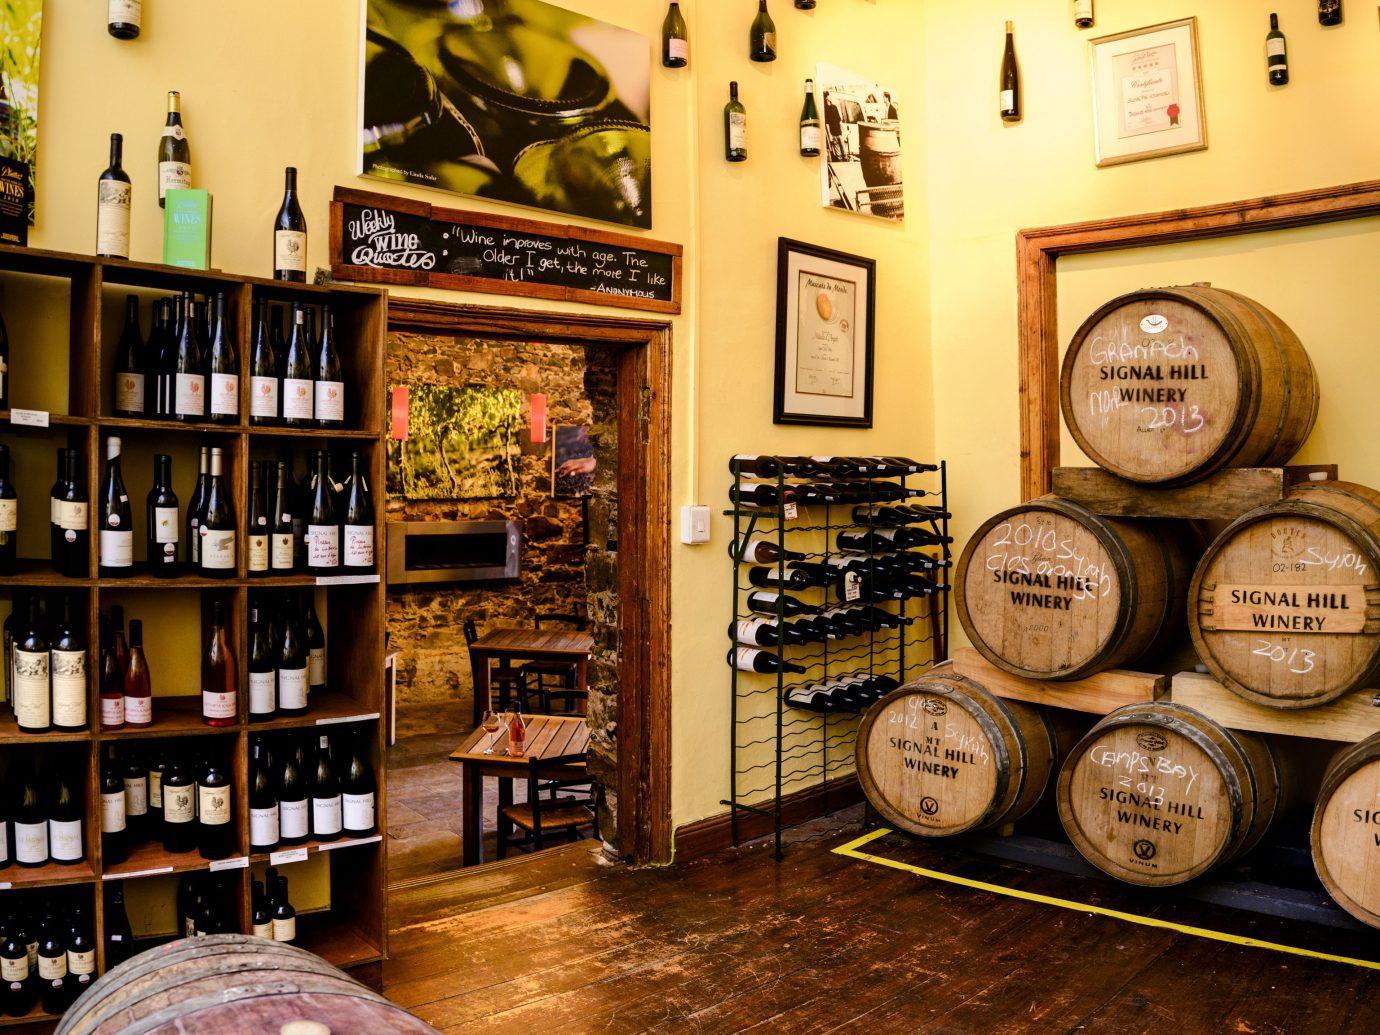 Hotels indoor man made object shelf interior design Winery wood